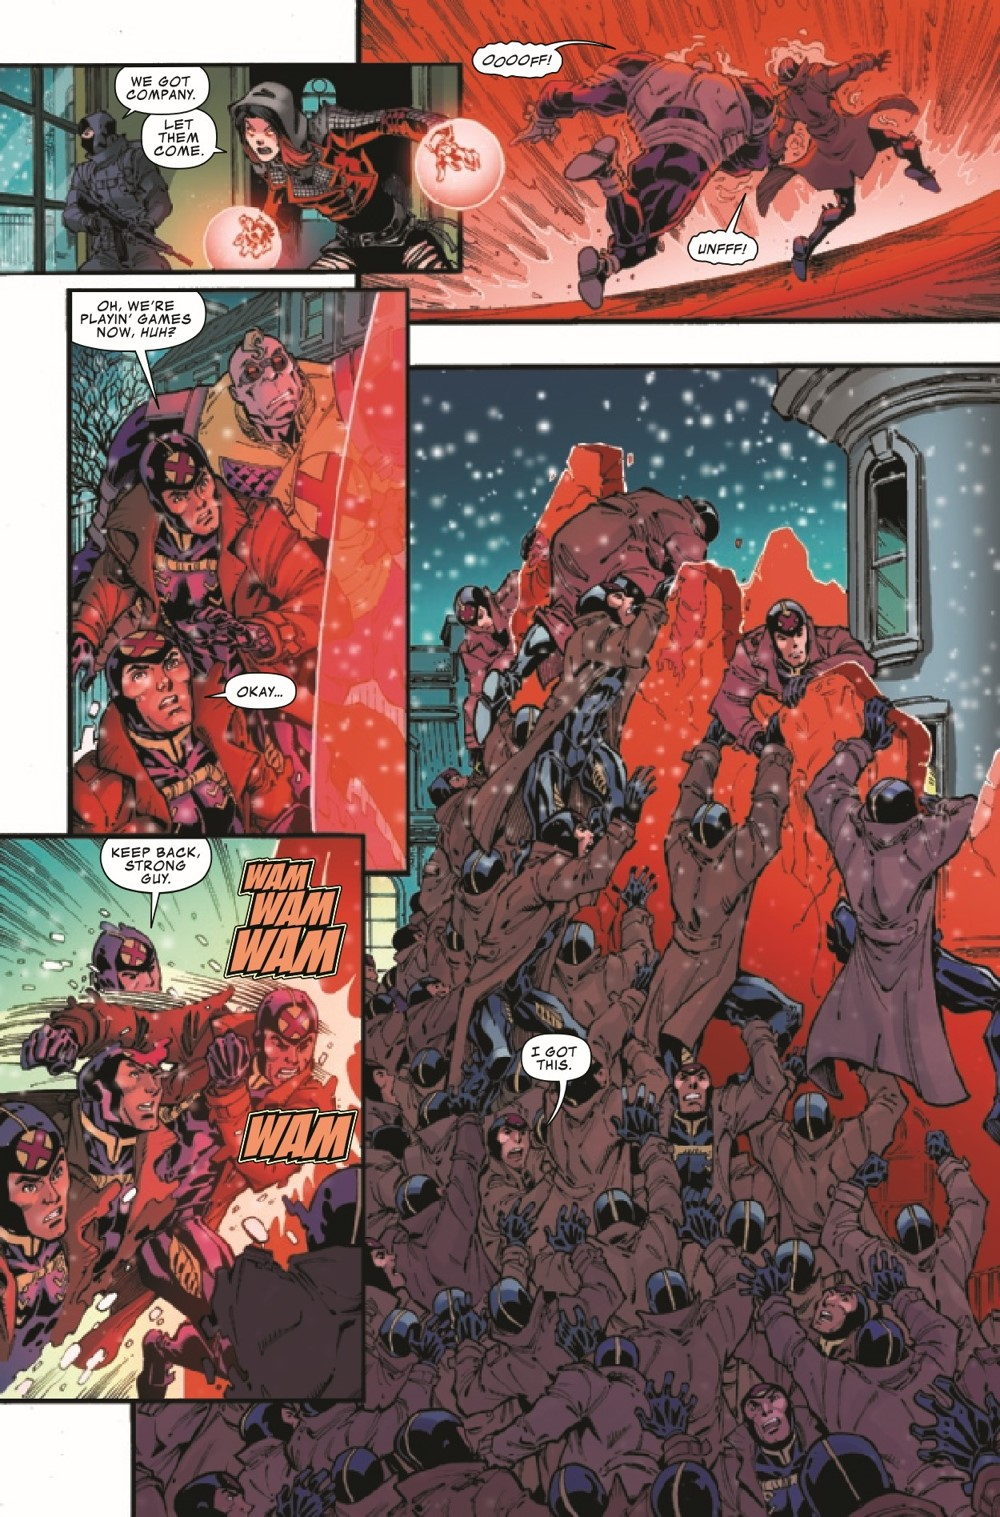 XMLEGENDS2021005_Preview-5 ComicList Previews: X-MEN LEGENDS #5